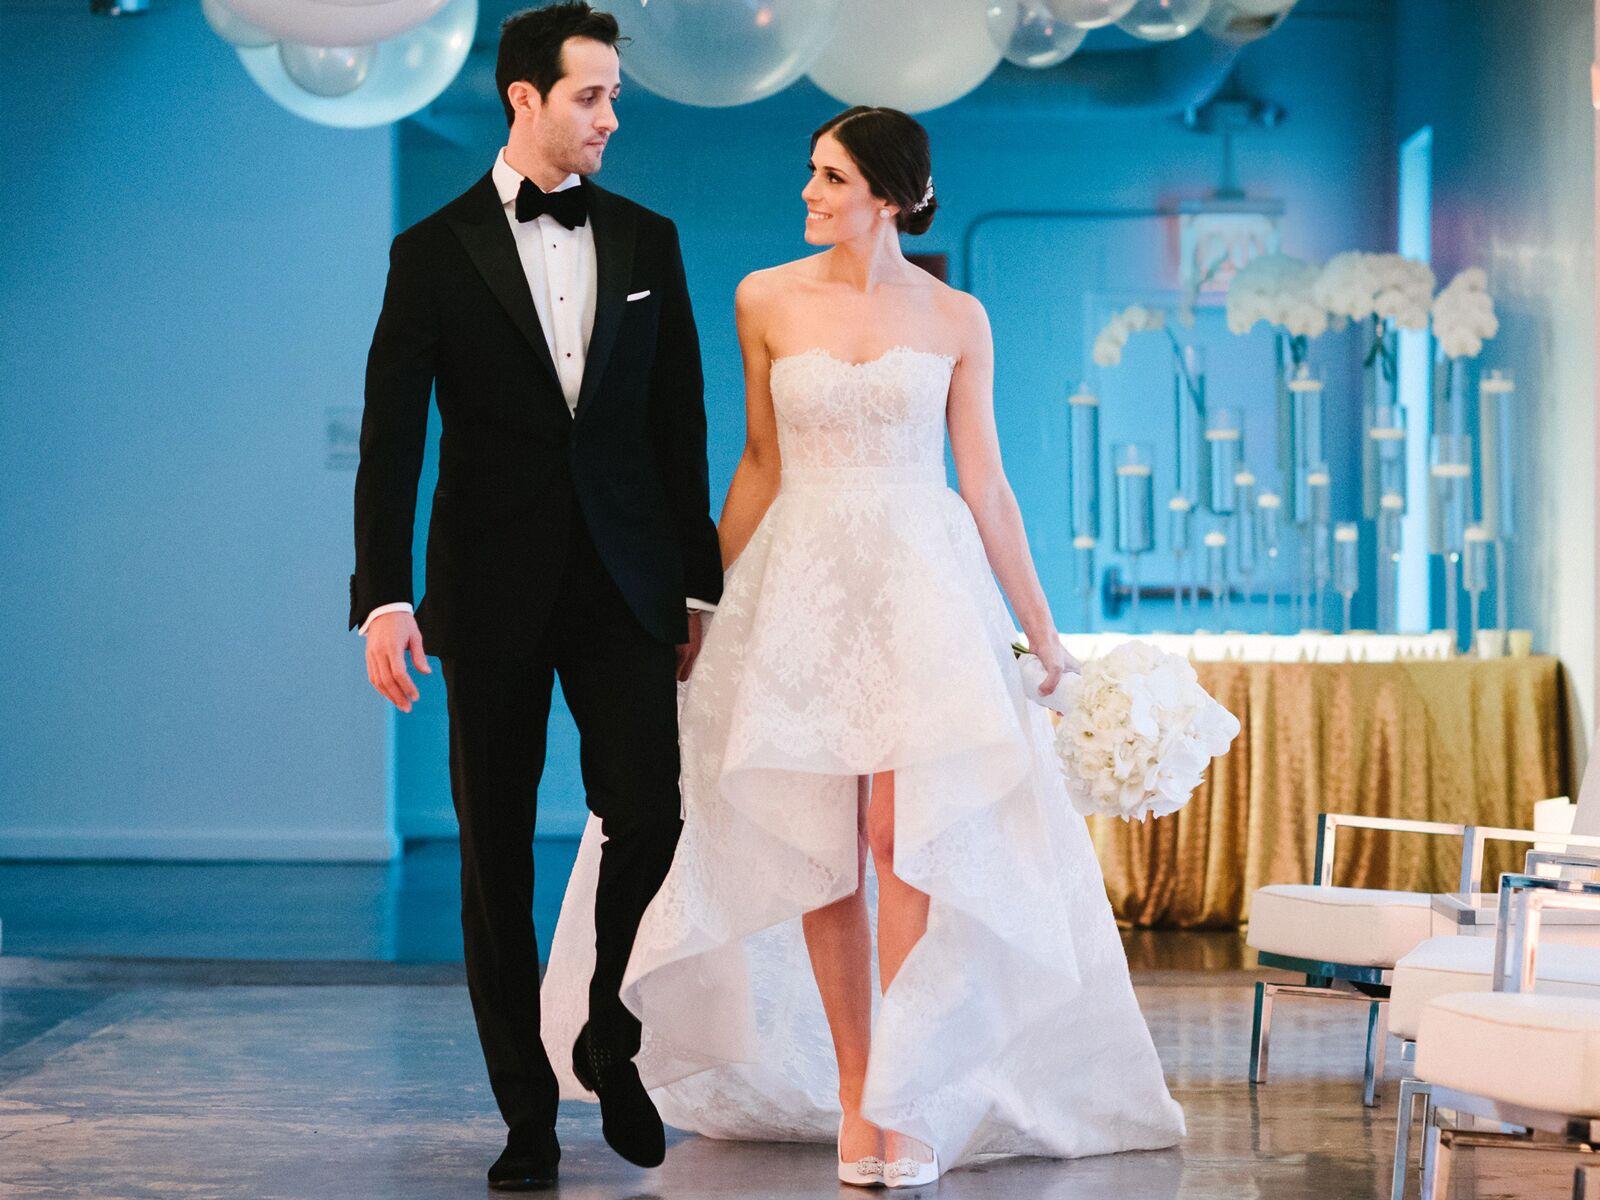 Wedding Reception Dresses 14 Short Wedding Reception Dresses